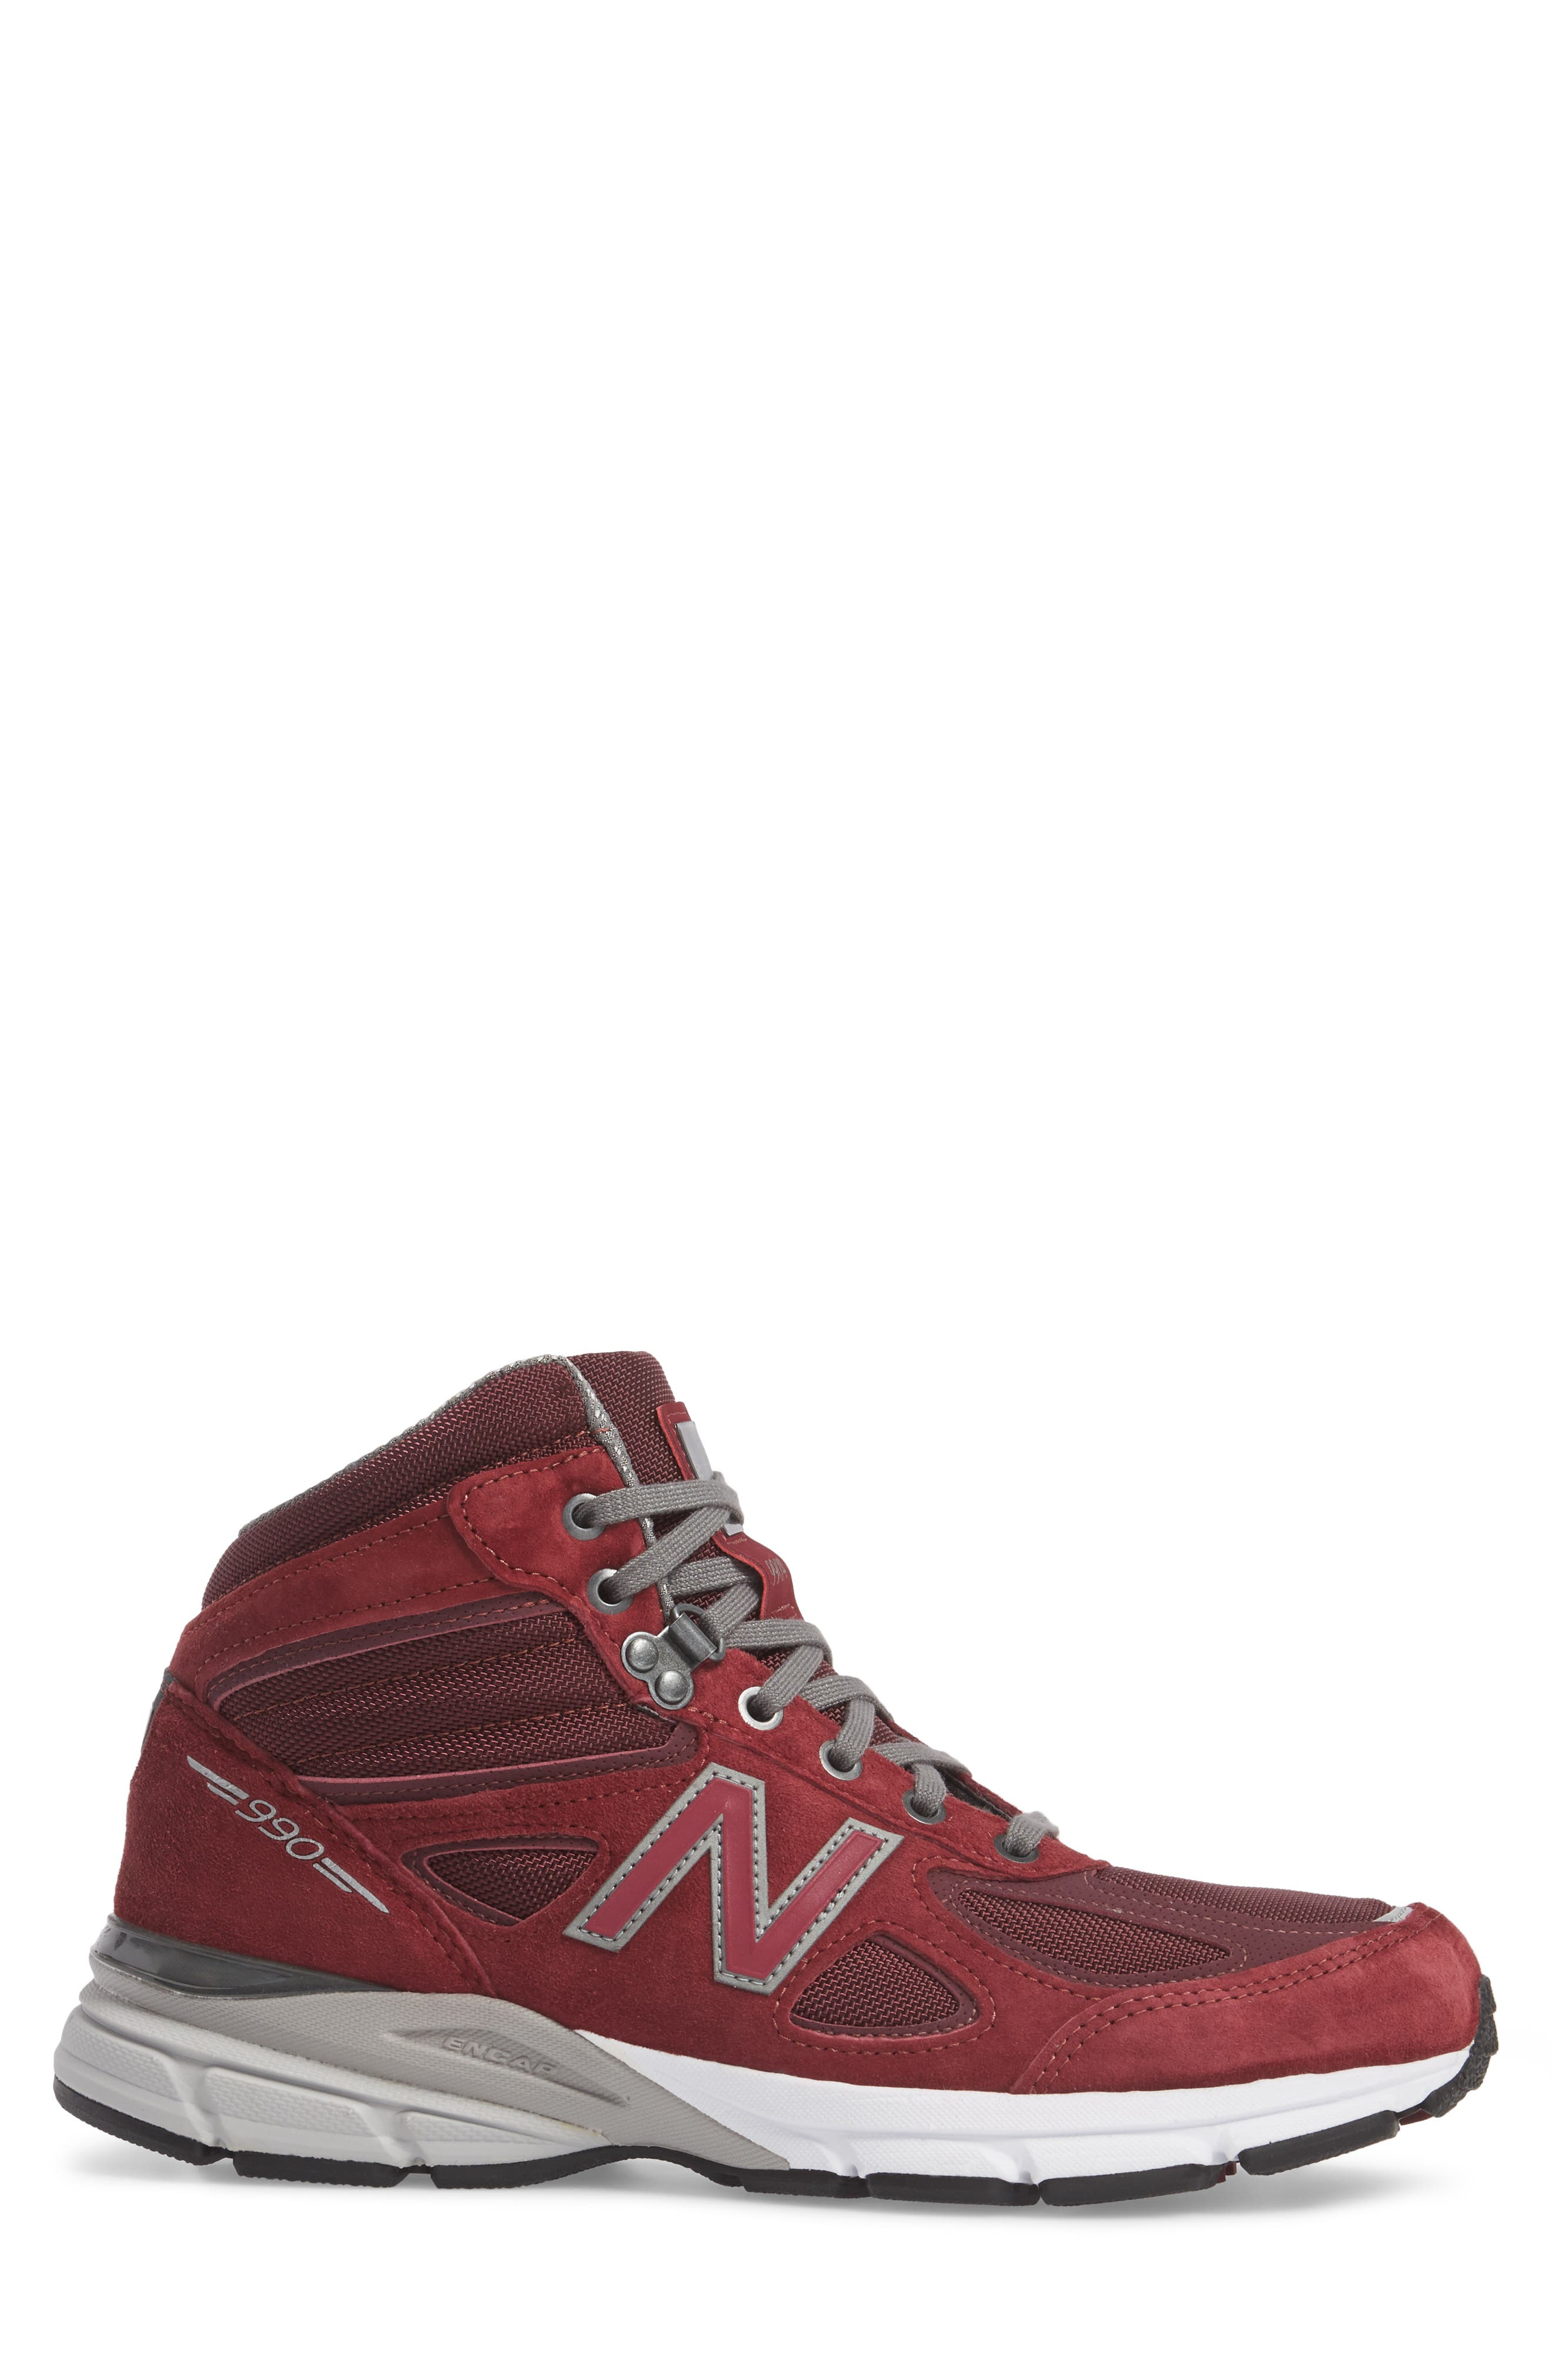 990v4 Water Resistant Sneaker Boot,                             Alternate thumbnail 3, color,                             932